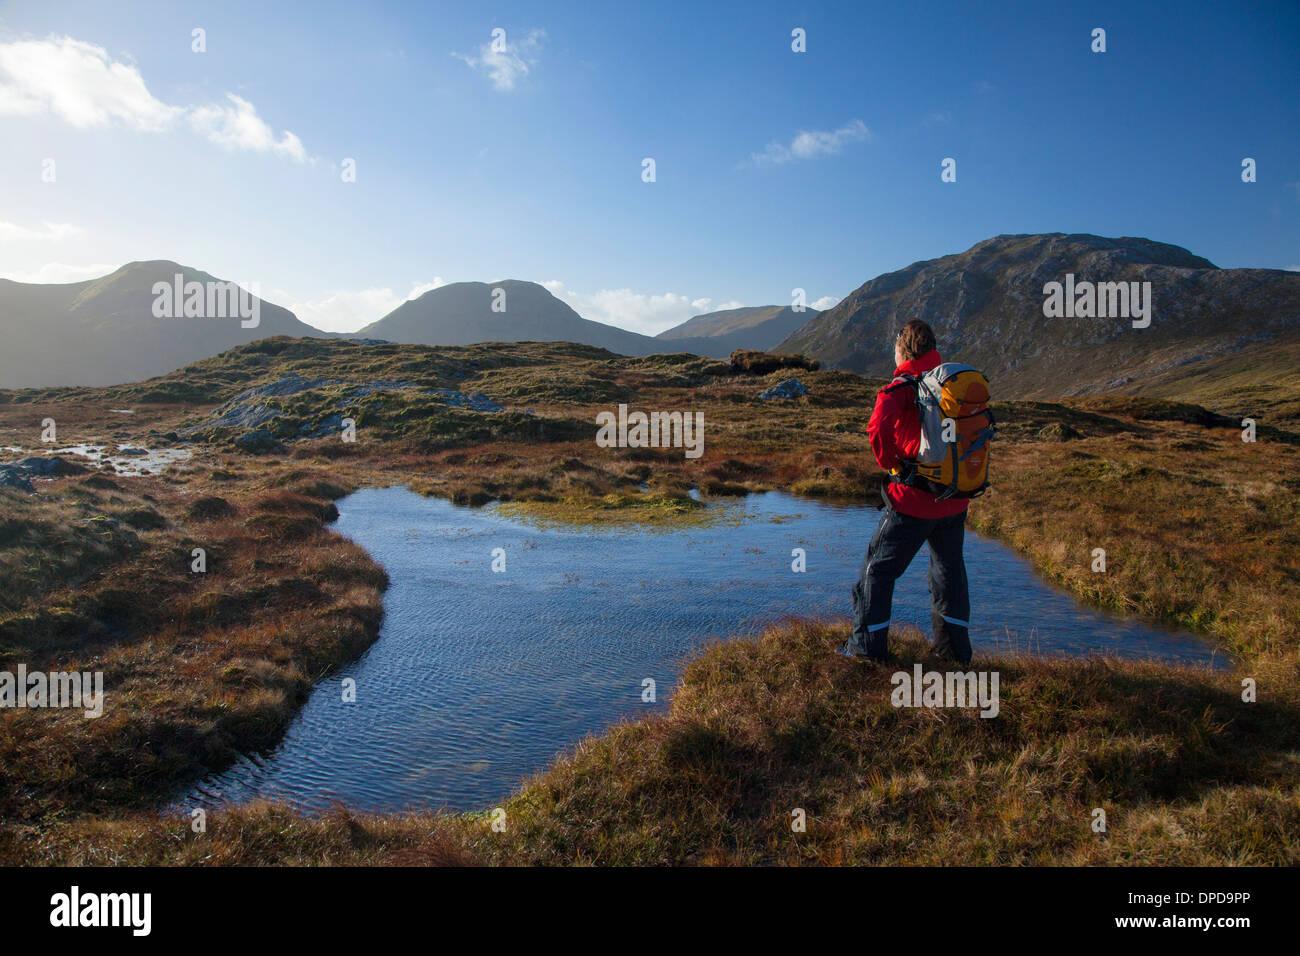 Walker beside a bog pool on a ridge high in the Twelve Bens, Connemara, County Galway, Ireland. - Stock Image